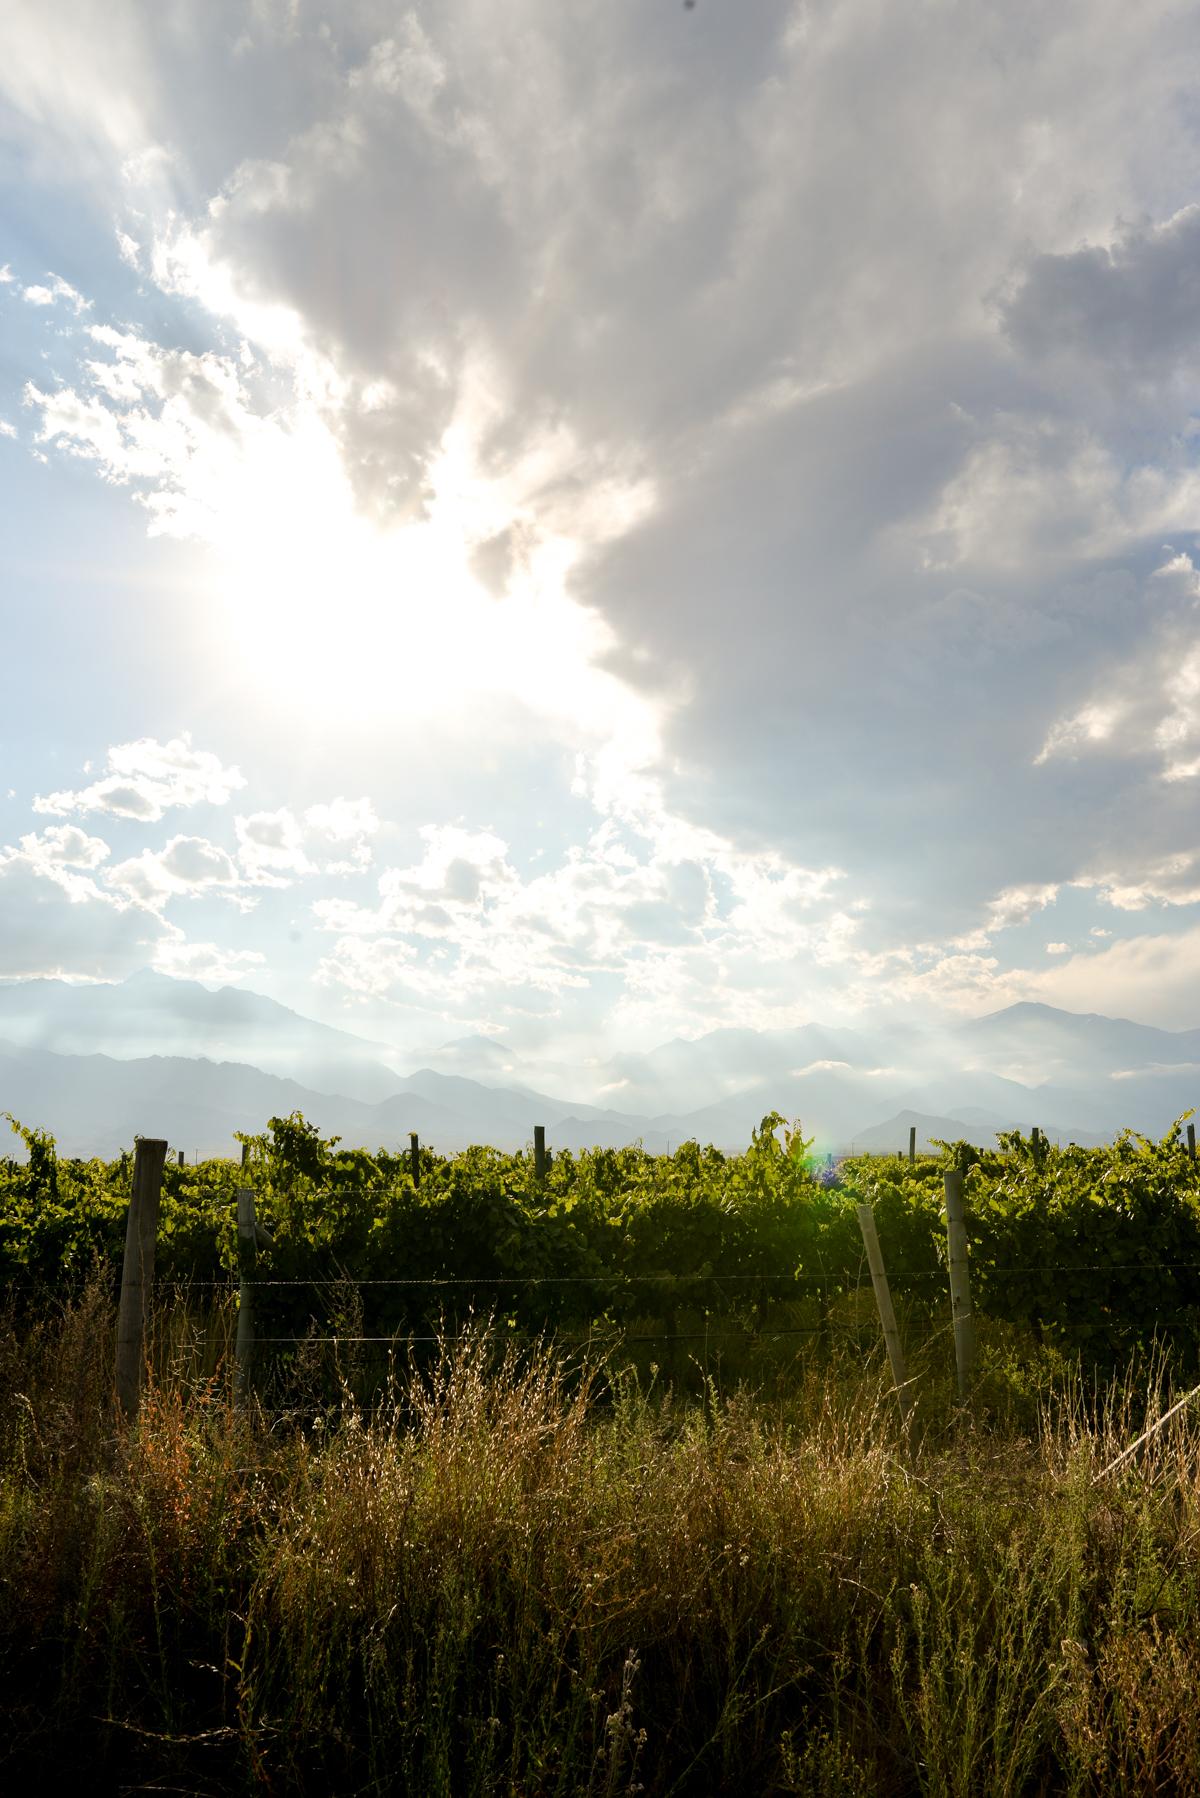 Stacie-Flinner-Best-Mendoza-Winery-14